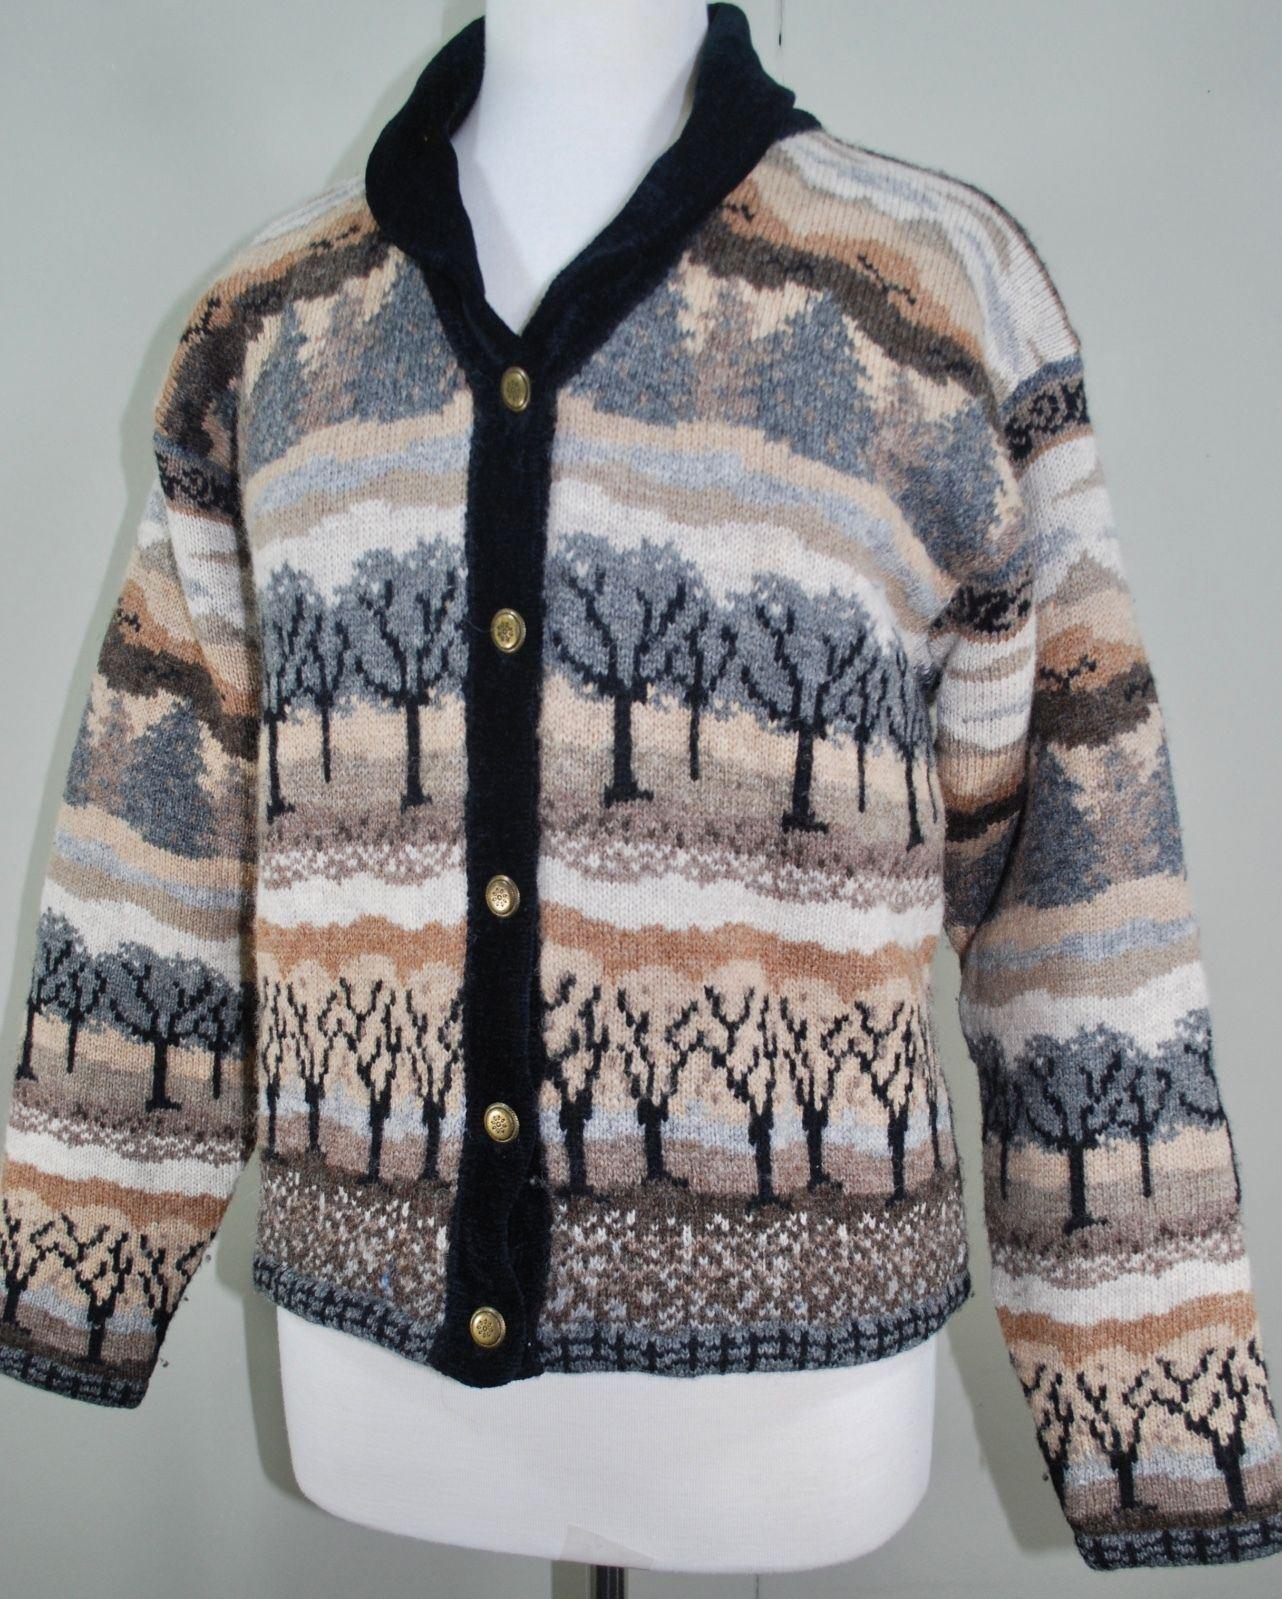 ICELANDIC DESIGN Wool Cardigan Sweater Women's M - Chenille Collar - Tree Print